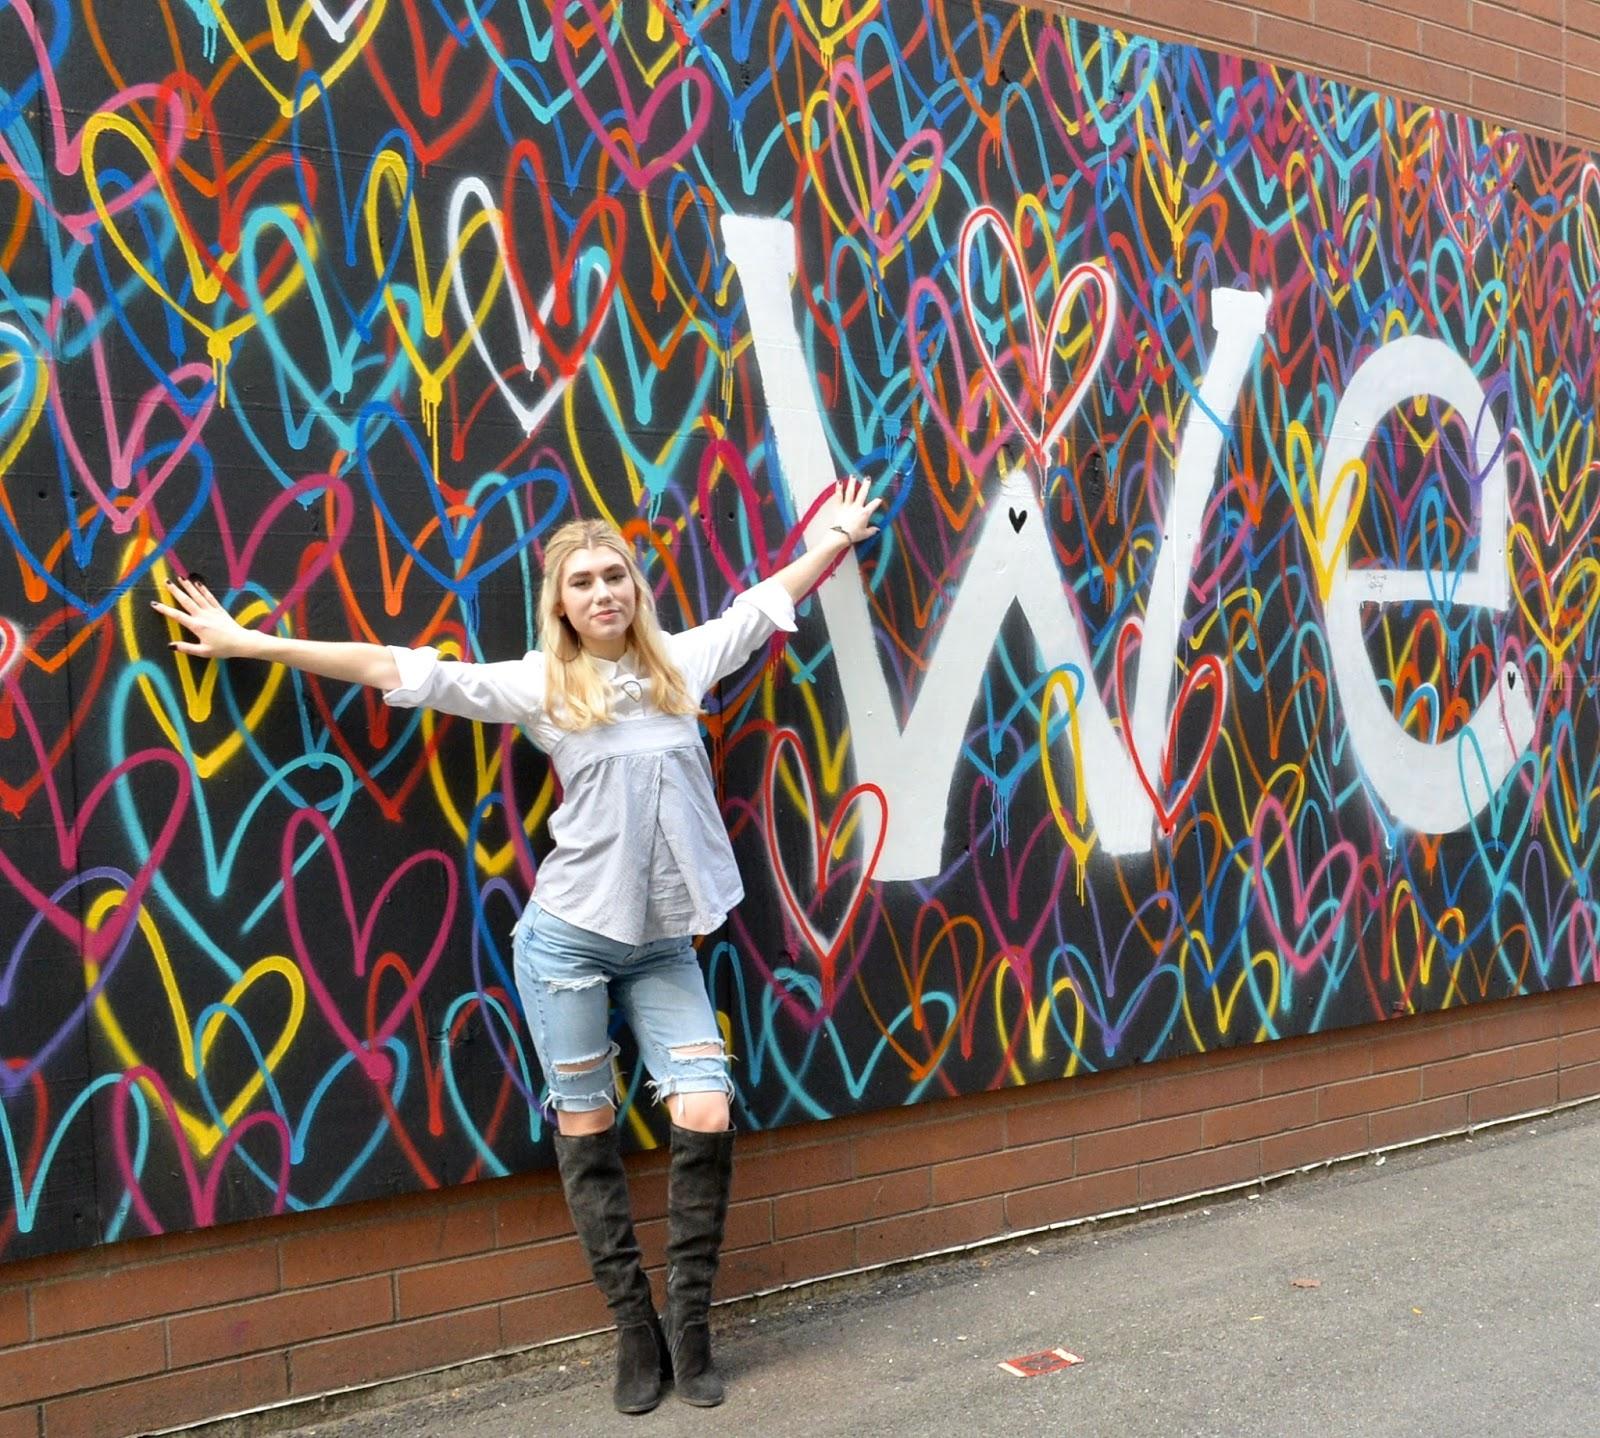 Hugging a Chicago bleeding hearts mural in Wicker Park